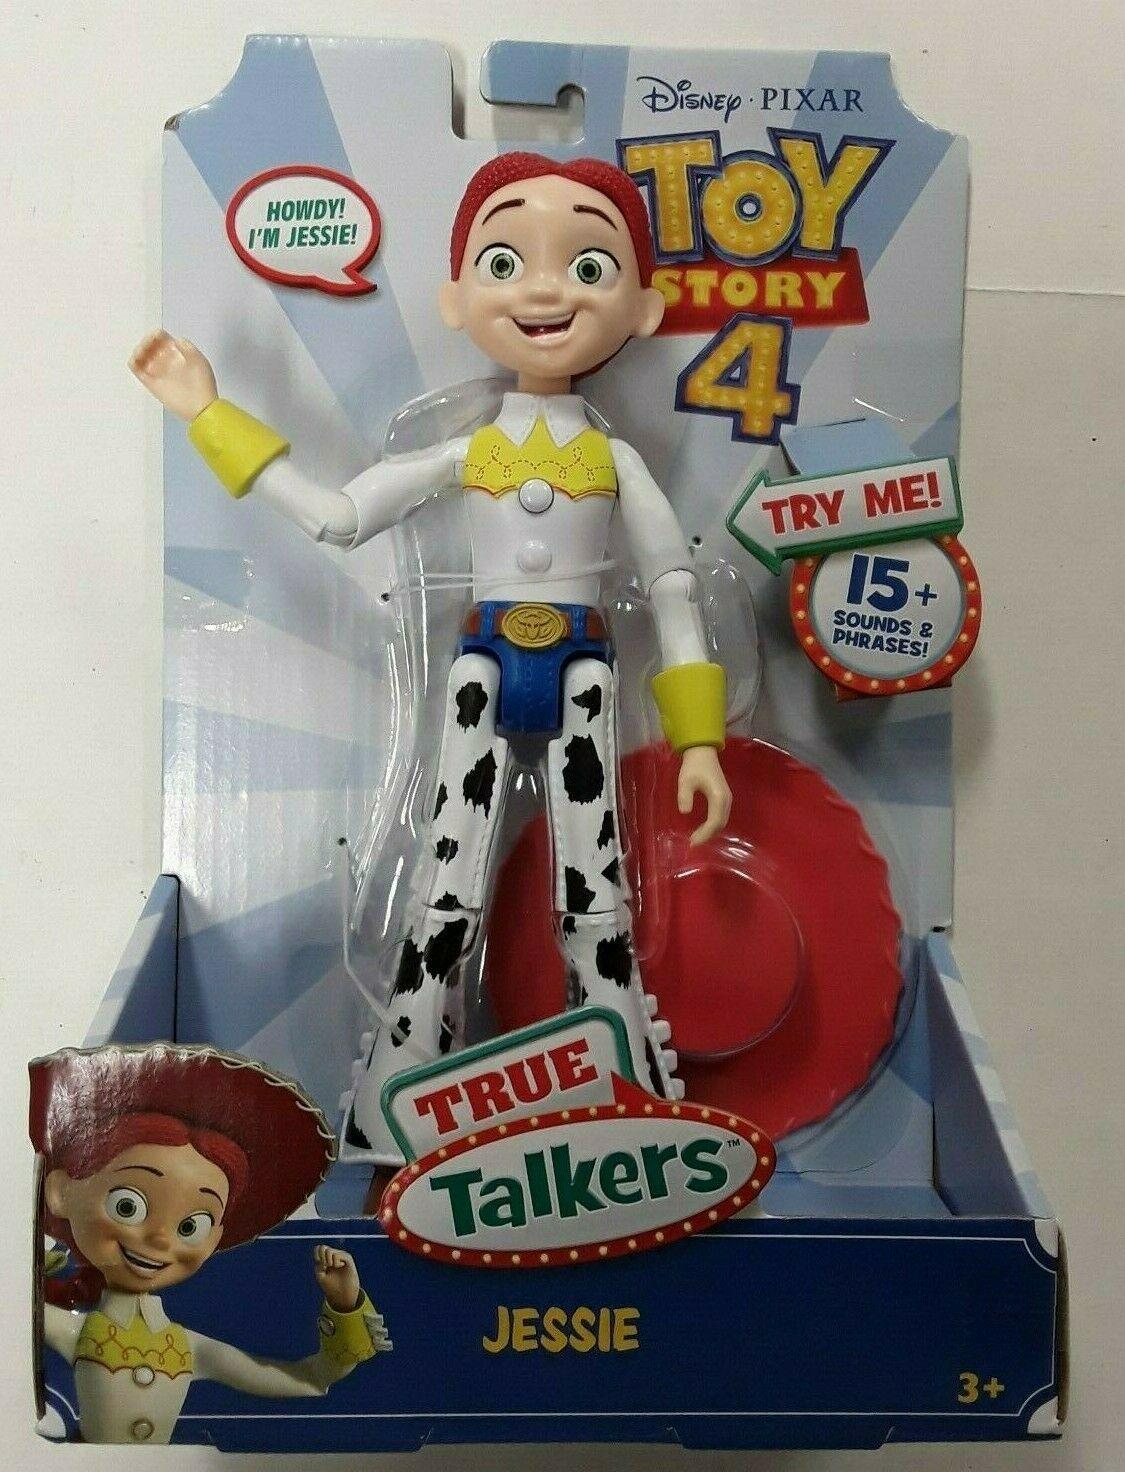 "Disney Pixar Toy Story 4 True Talkers Talking JESSIE Figure 8.8"" BRAND NEW HTF"